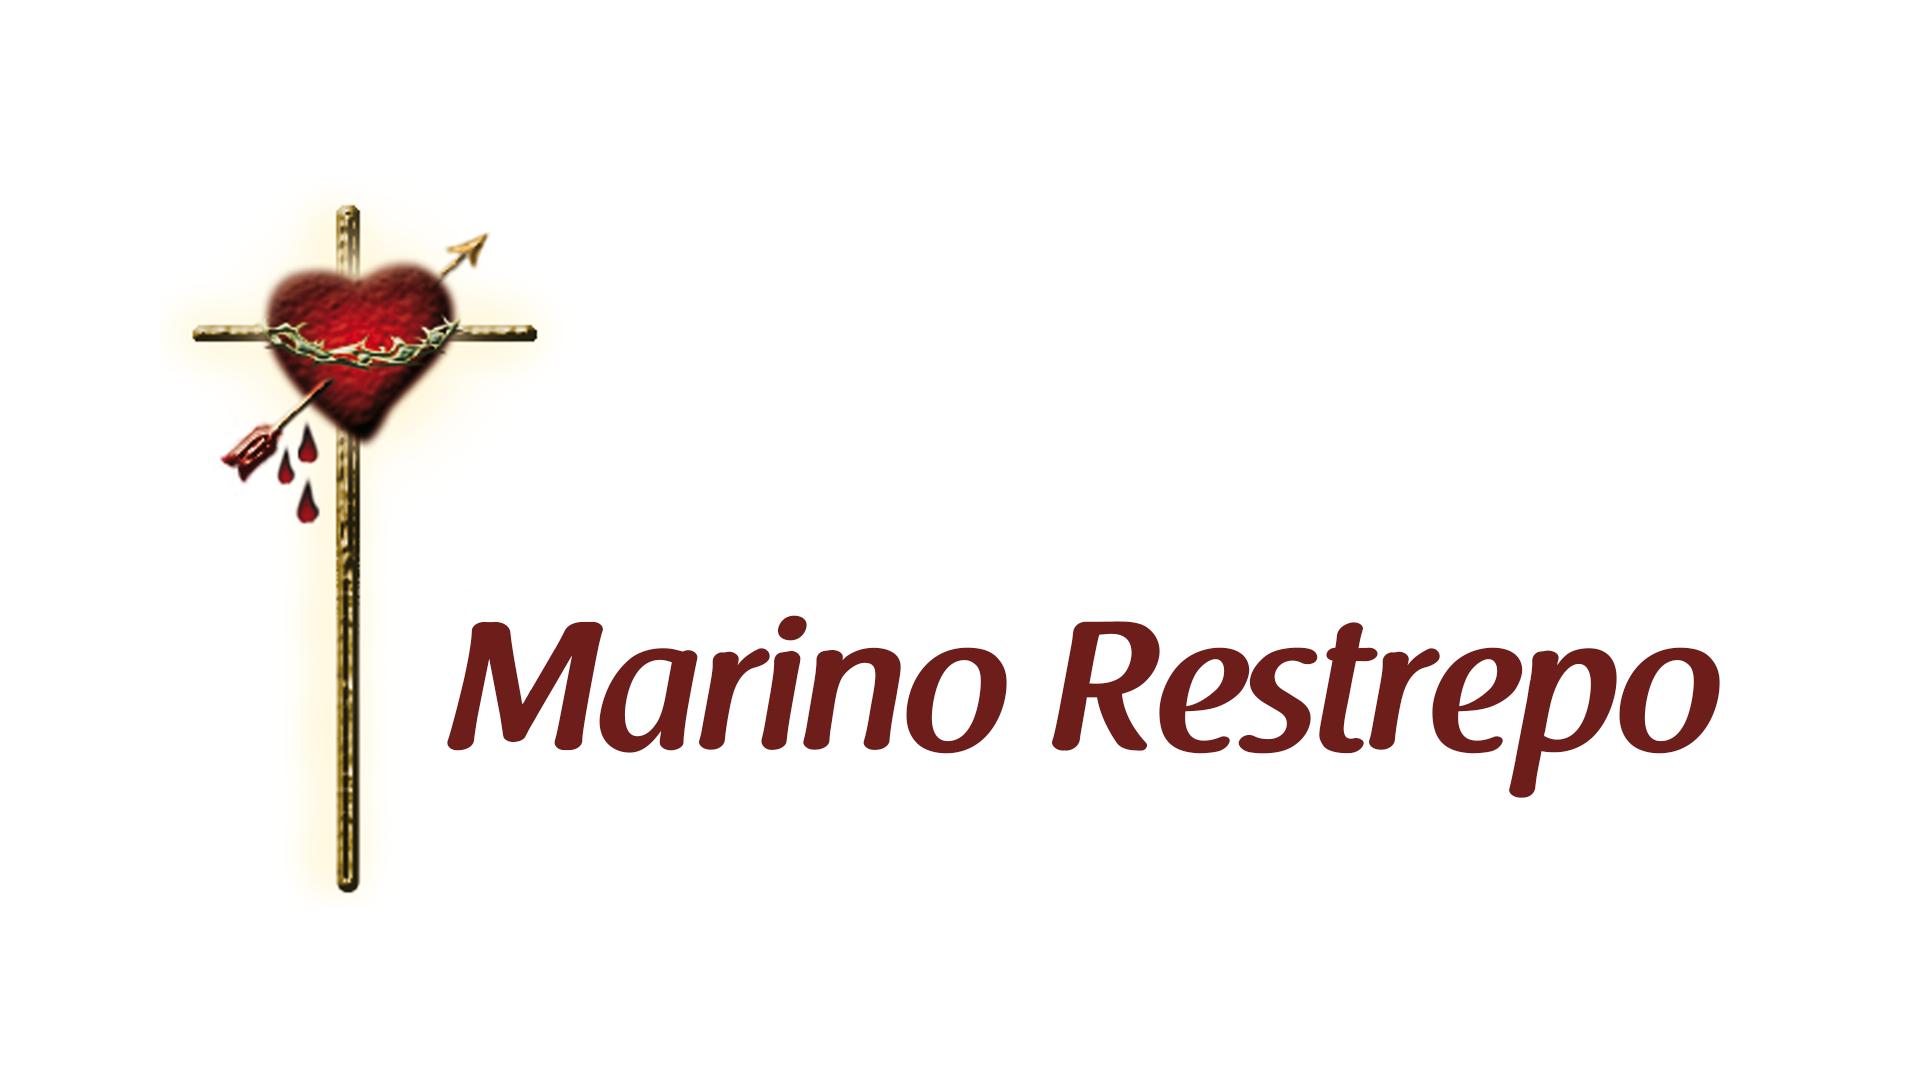 Marino Restrepo - Tienda Virtual